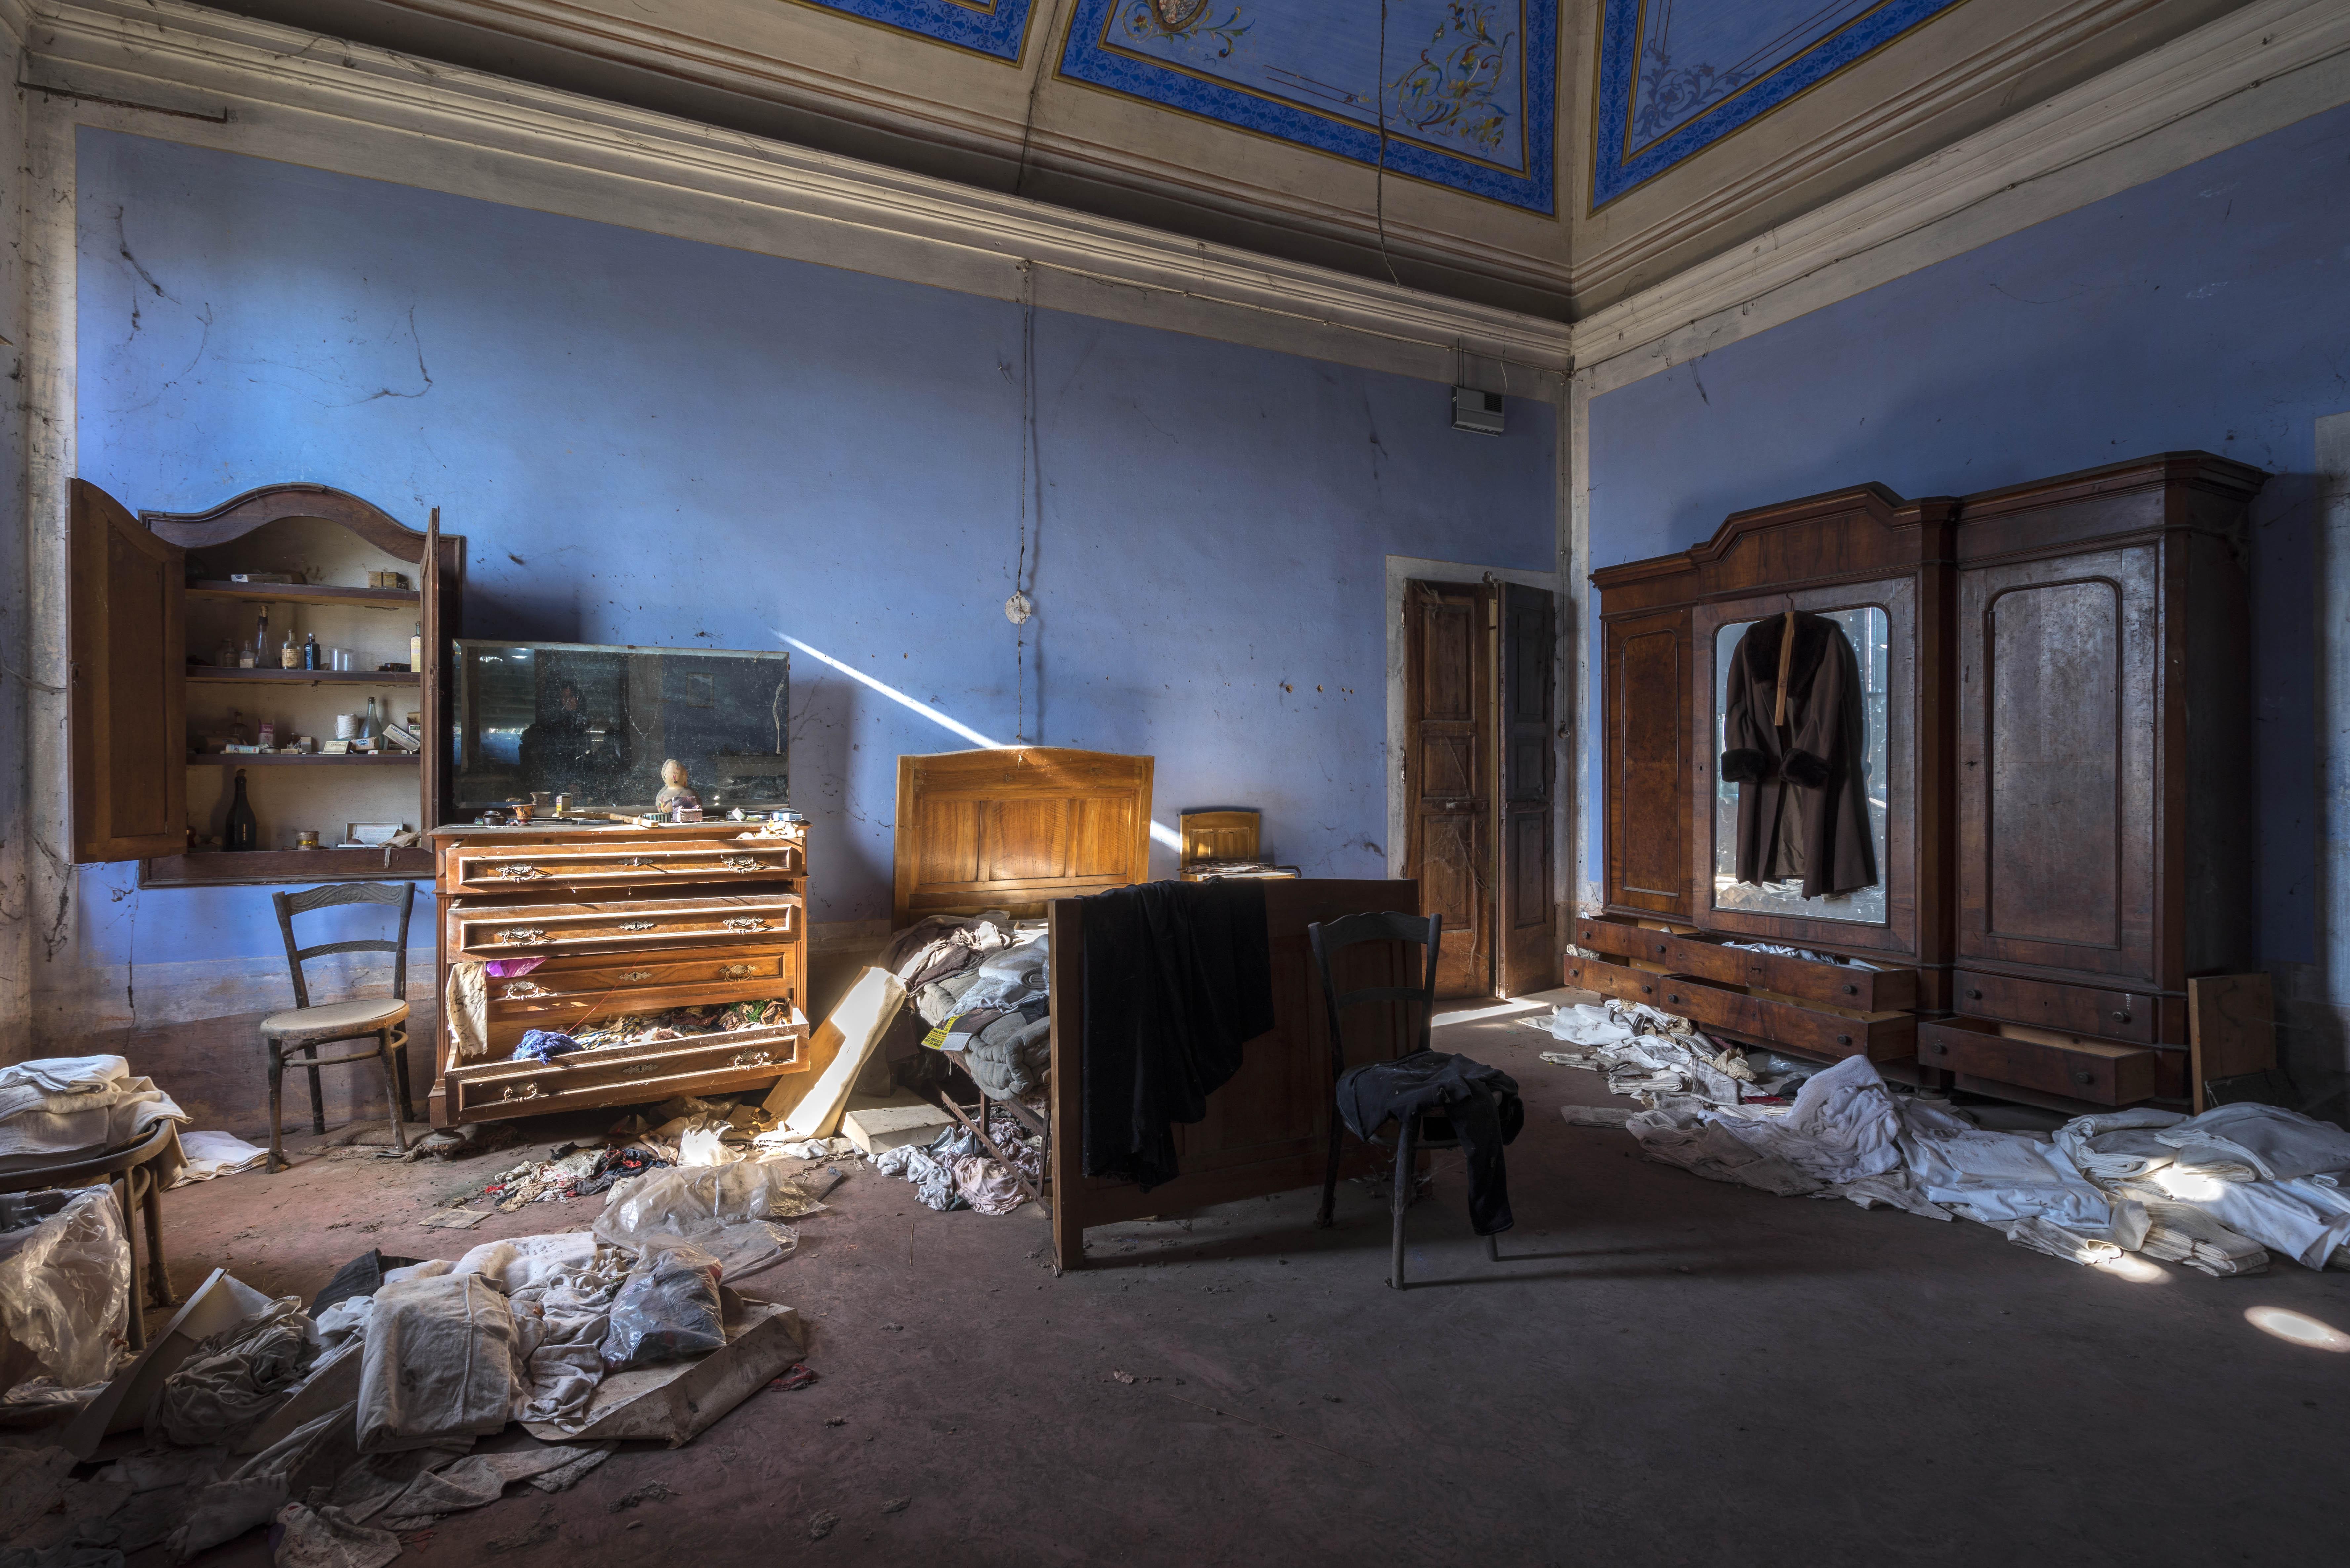 Eleonora Costi, Abandoned